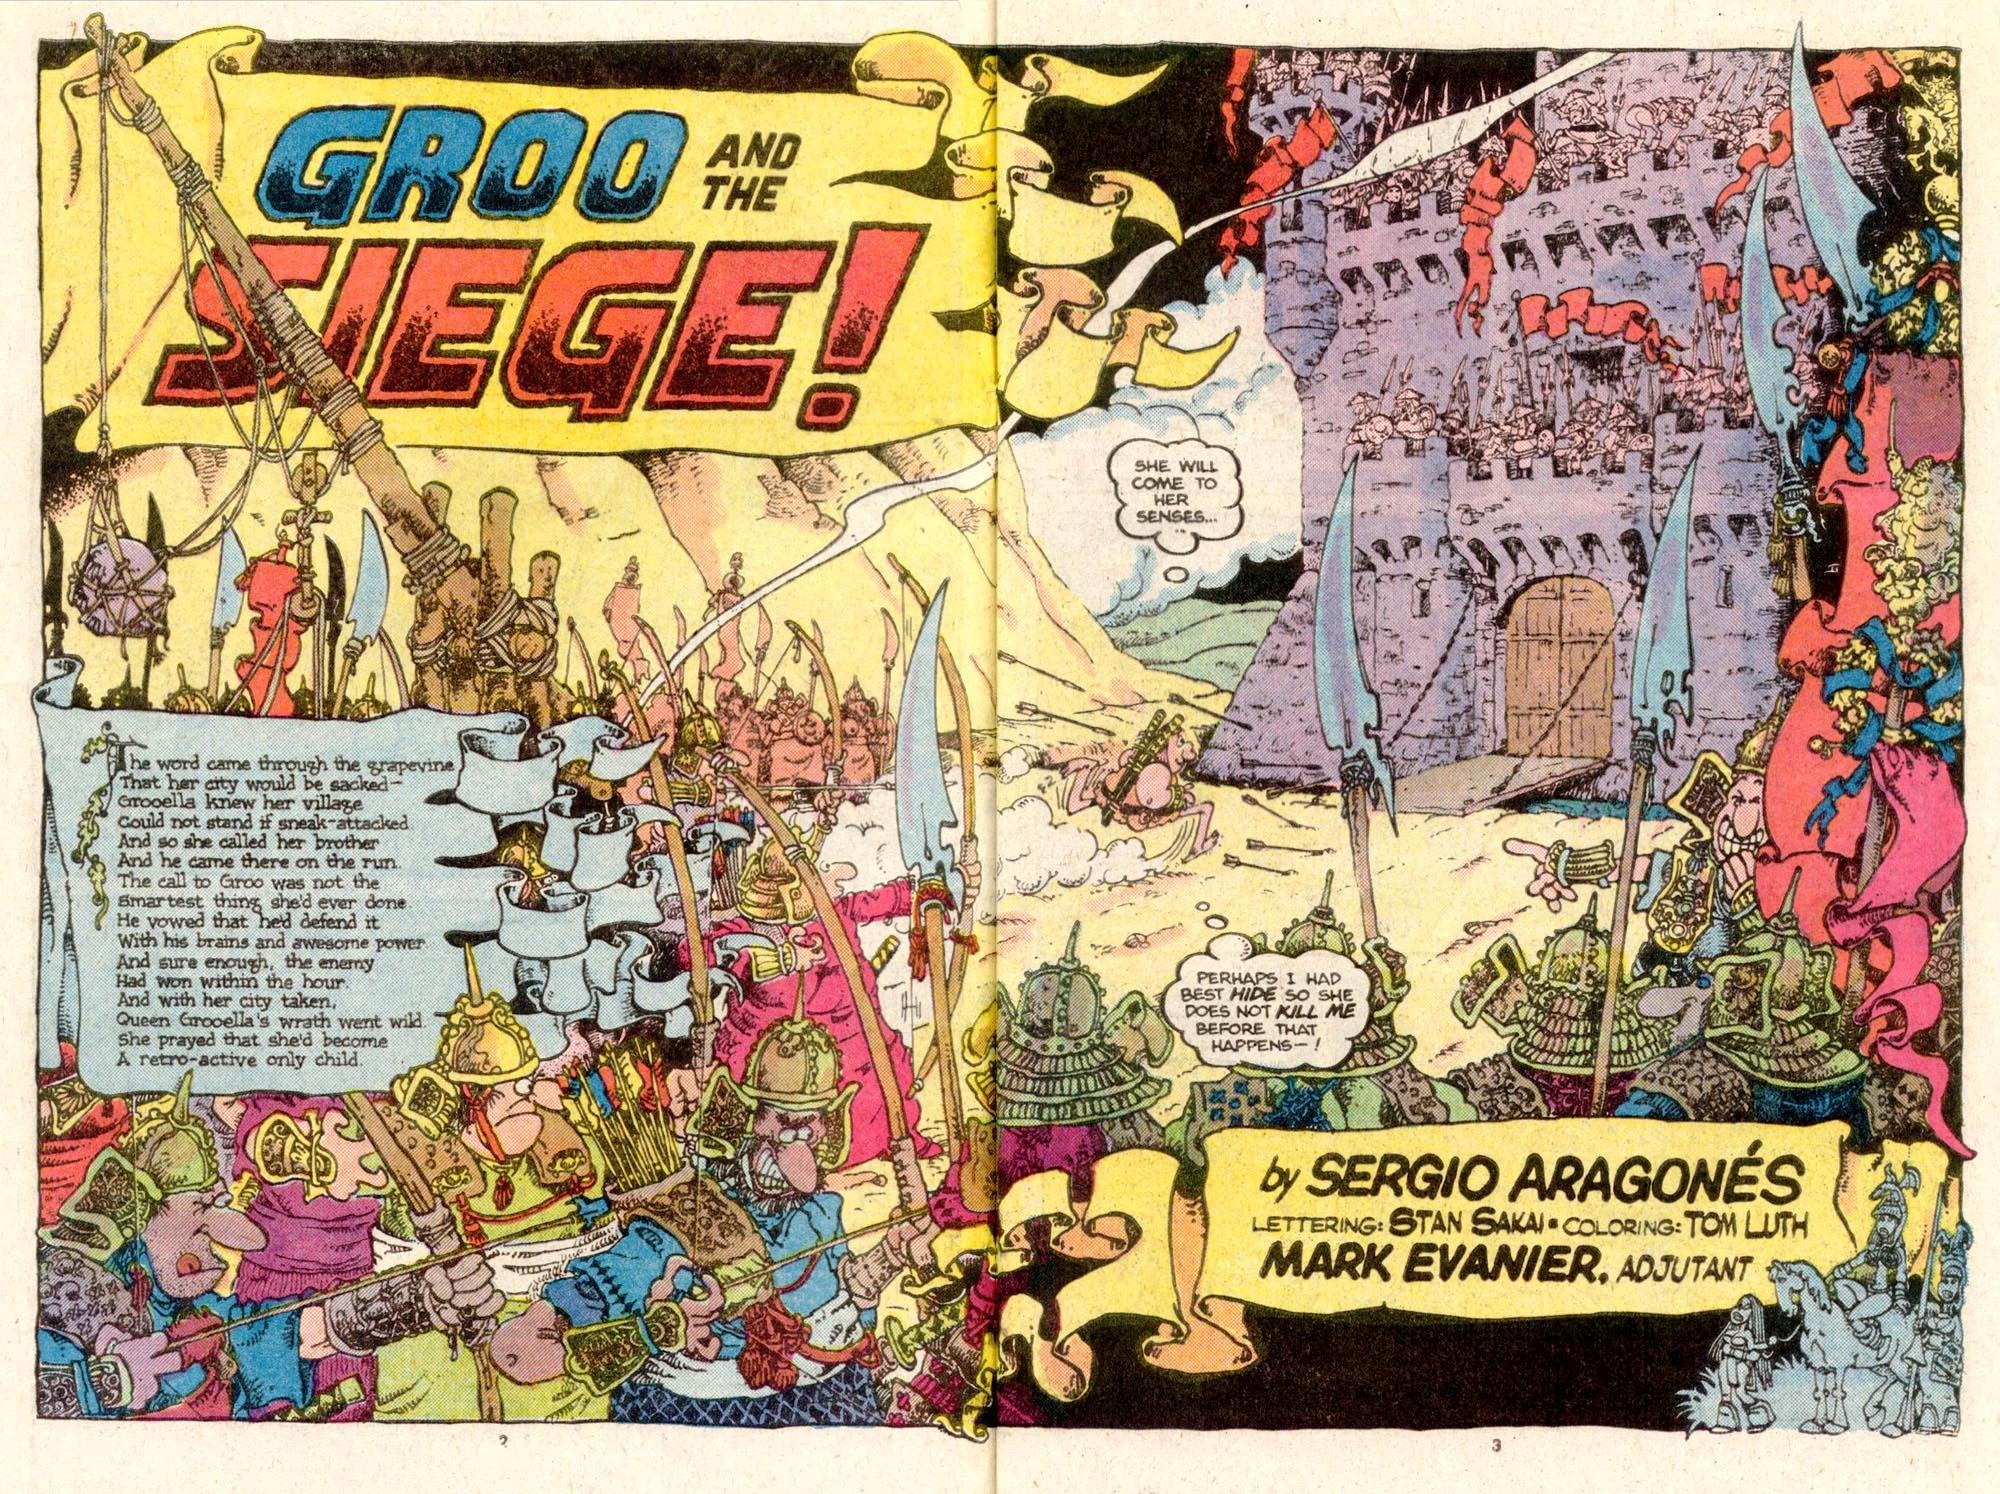 Read online Sergio Aragonés Groo the Wanderer comic -  Issue #19 - 3